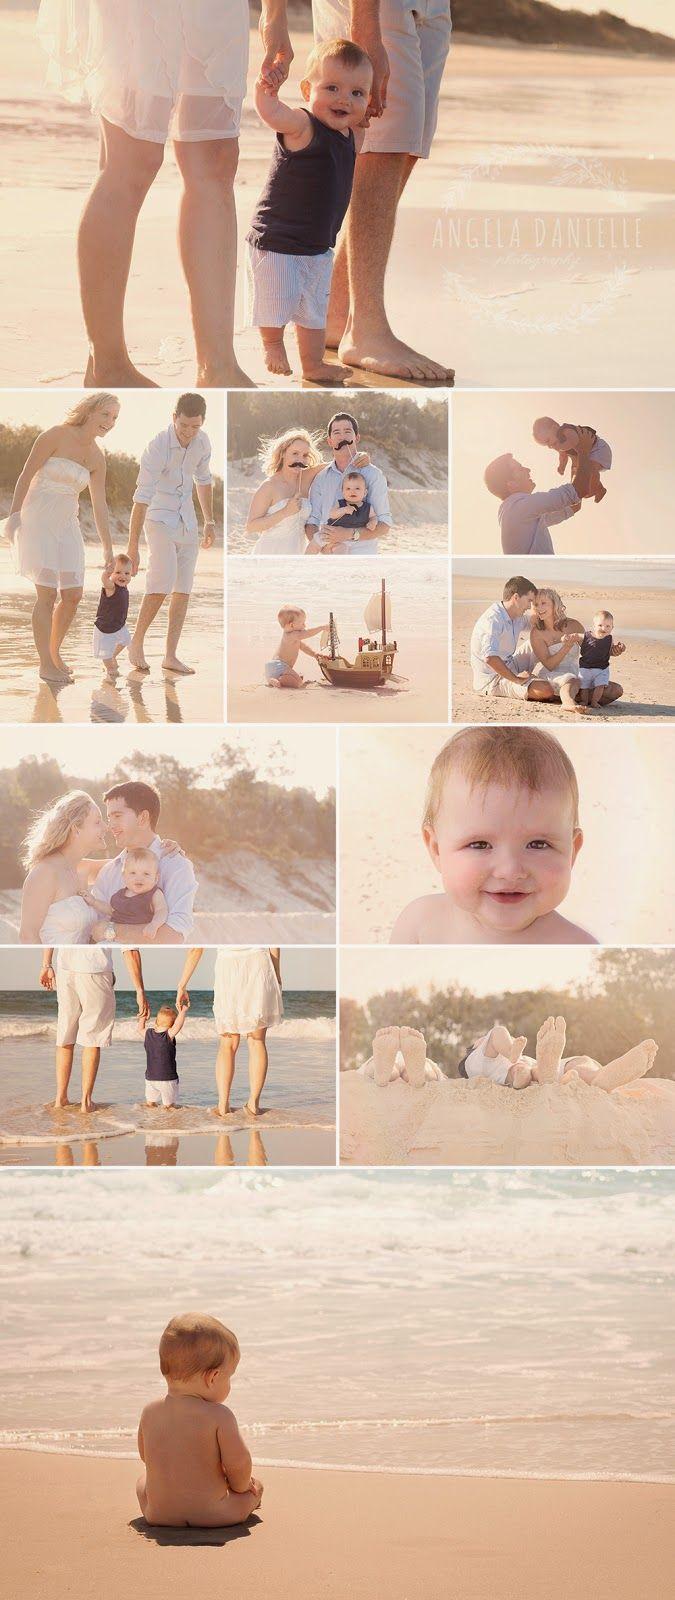 www.angeladanielle.com  Brisbane portrait photographer Beach family photography